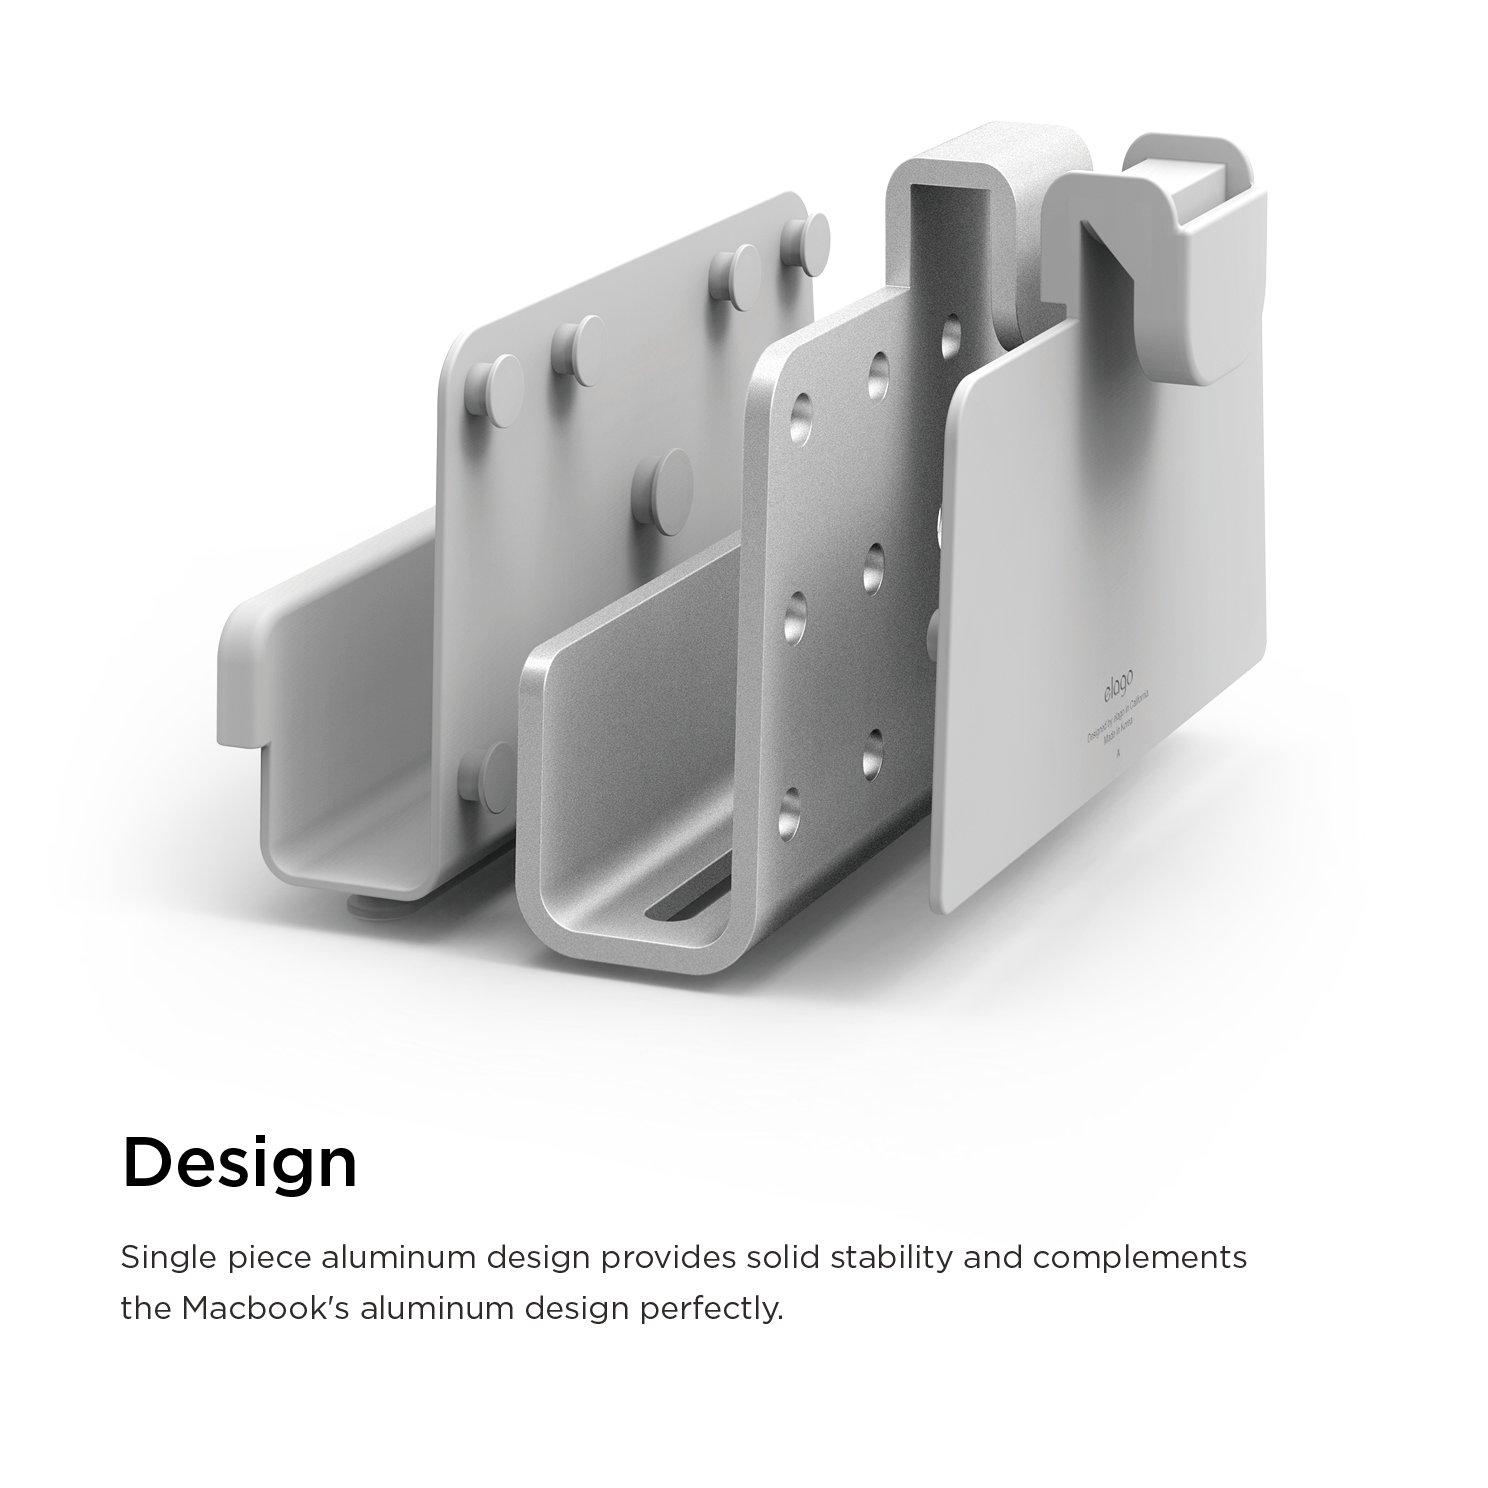 elago Pro Hanger for Mac - Laptop Shelf for iMac, Thunderbolt, and other Apple Displays by elago (Image #5)